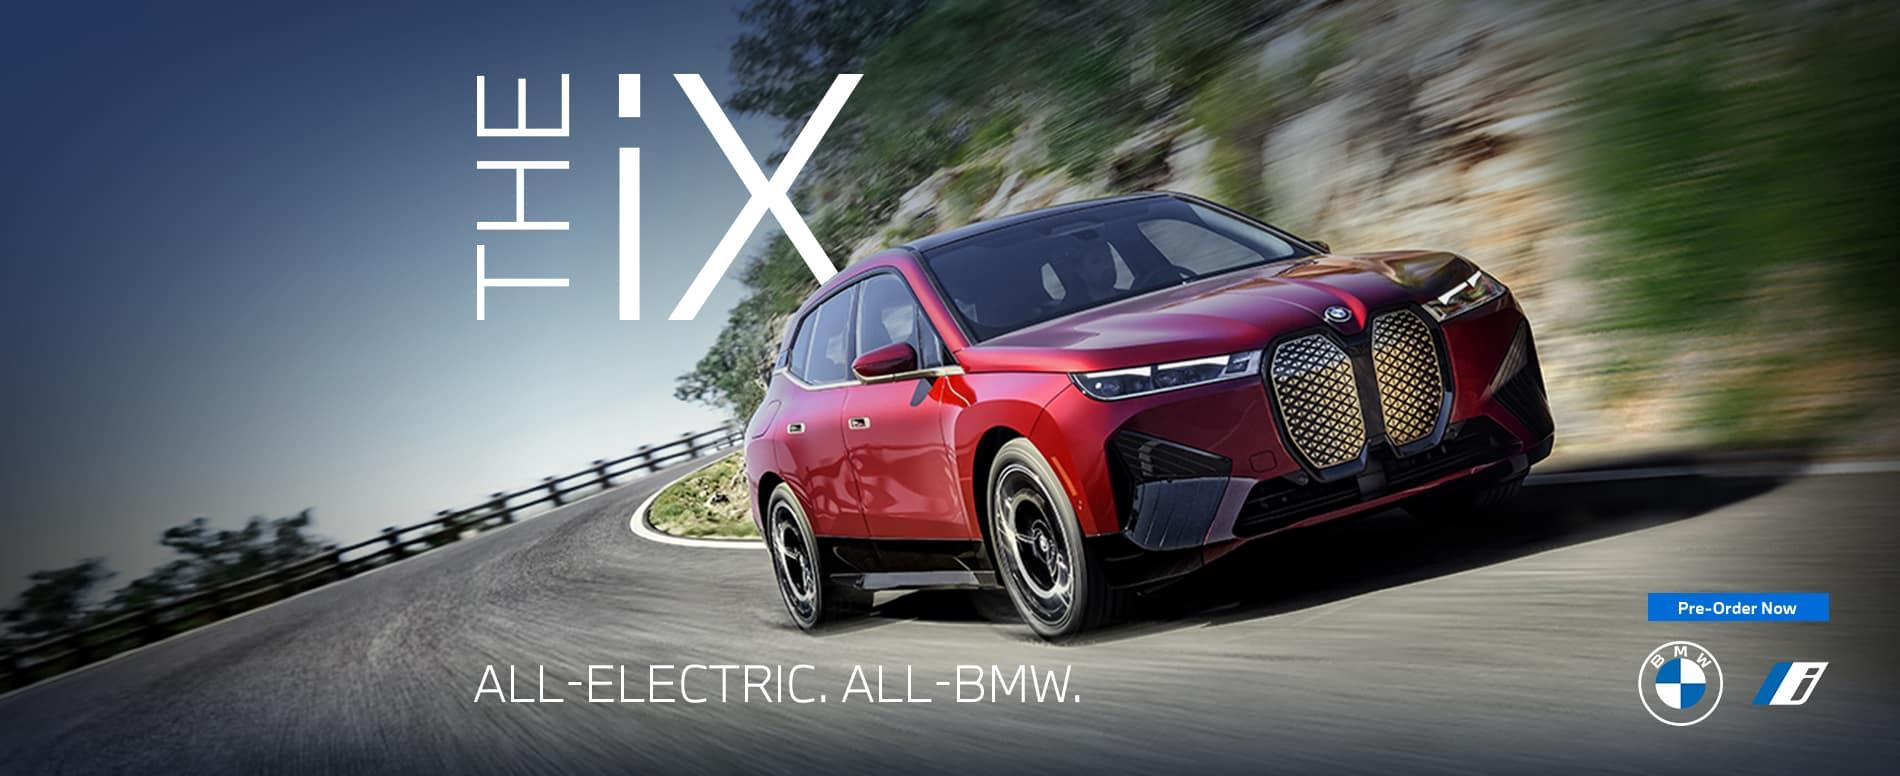 Pre-Order The BMW iX